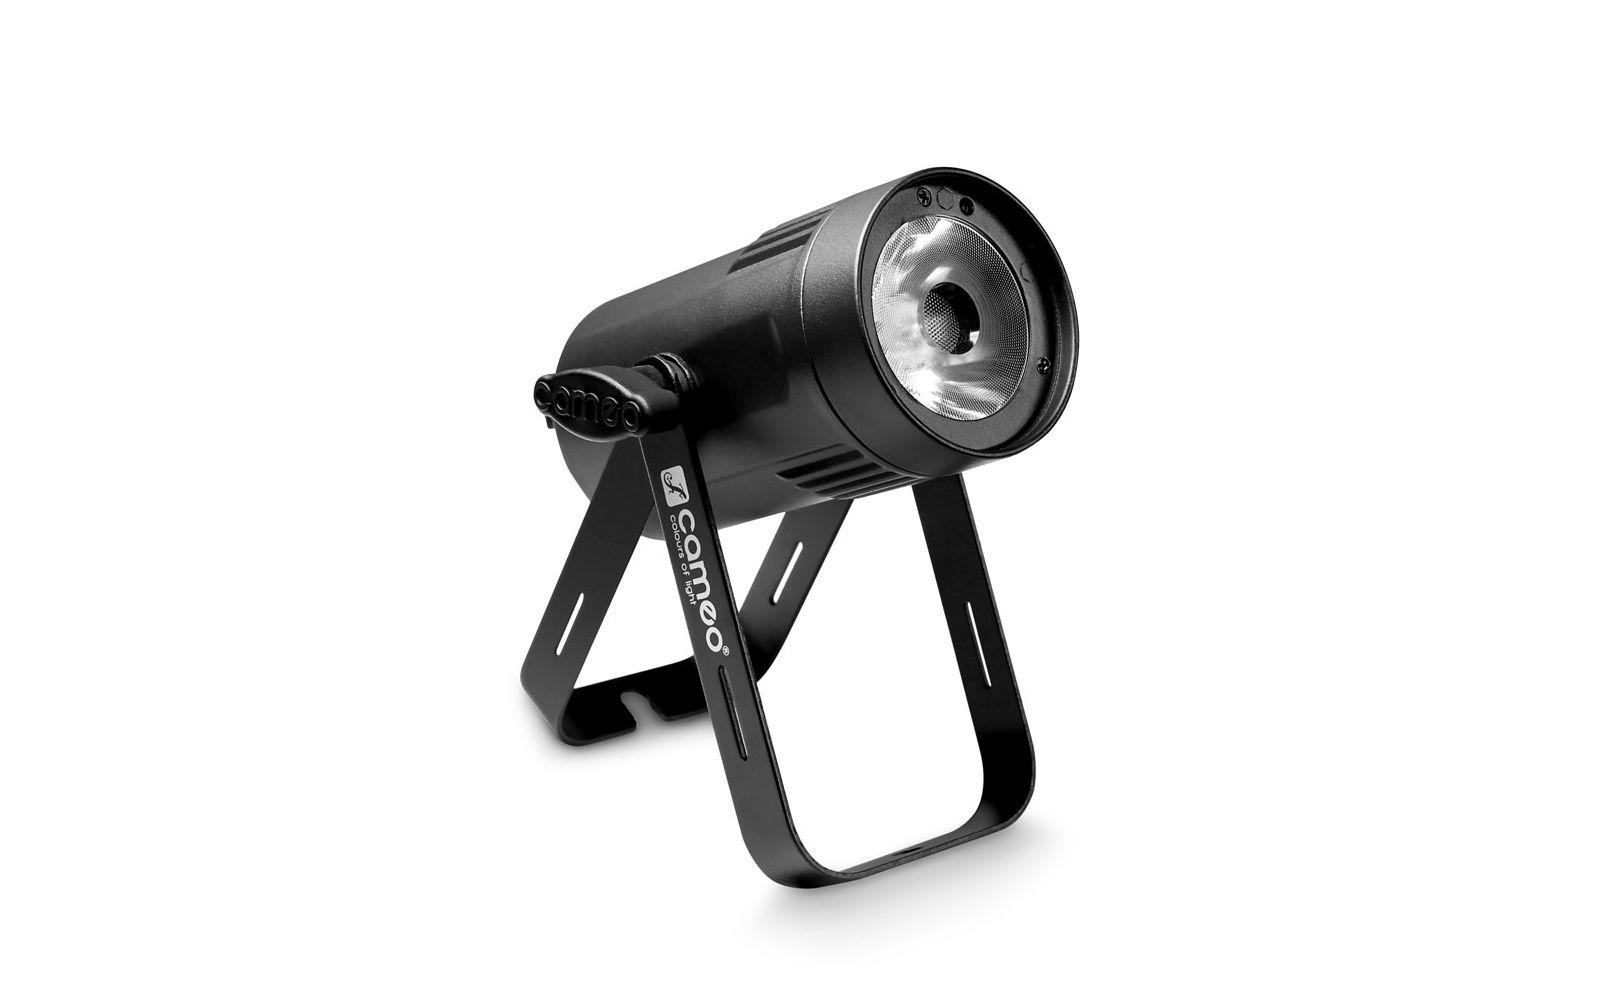 cameo-q-spot-15-w-kompakter-spot-mit-15w-warmweiayer-led-in-schwarzer-ausfa-hrung